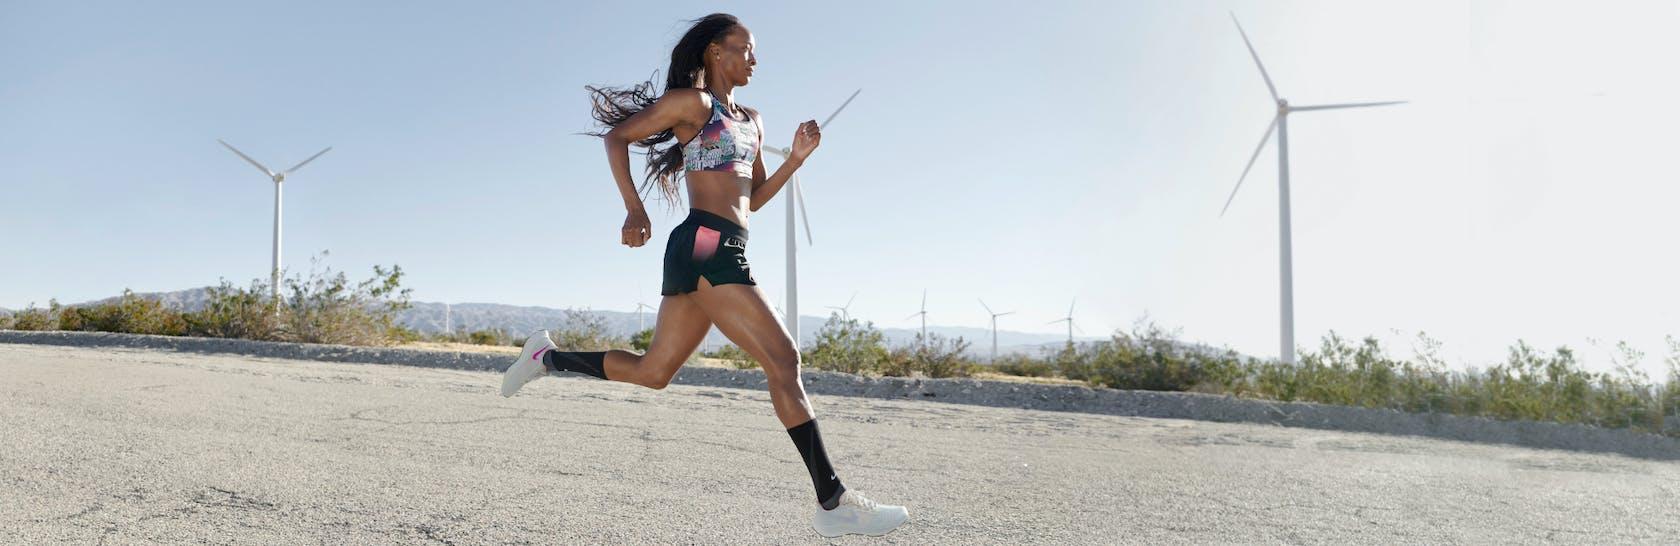 Nike Onlineshop Running